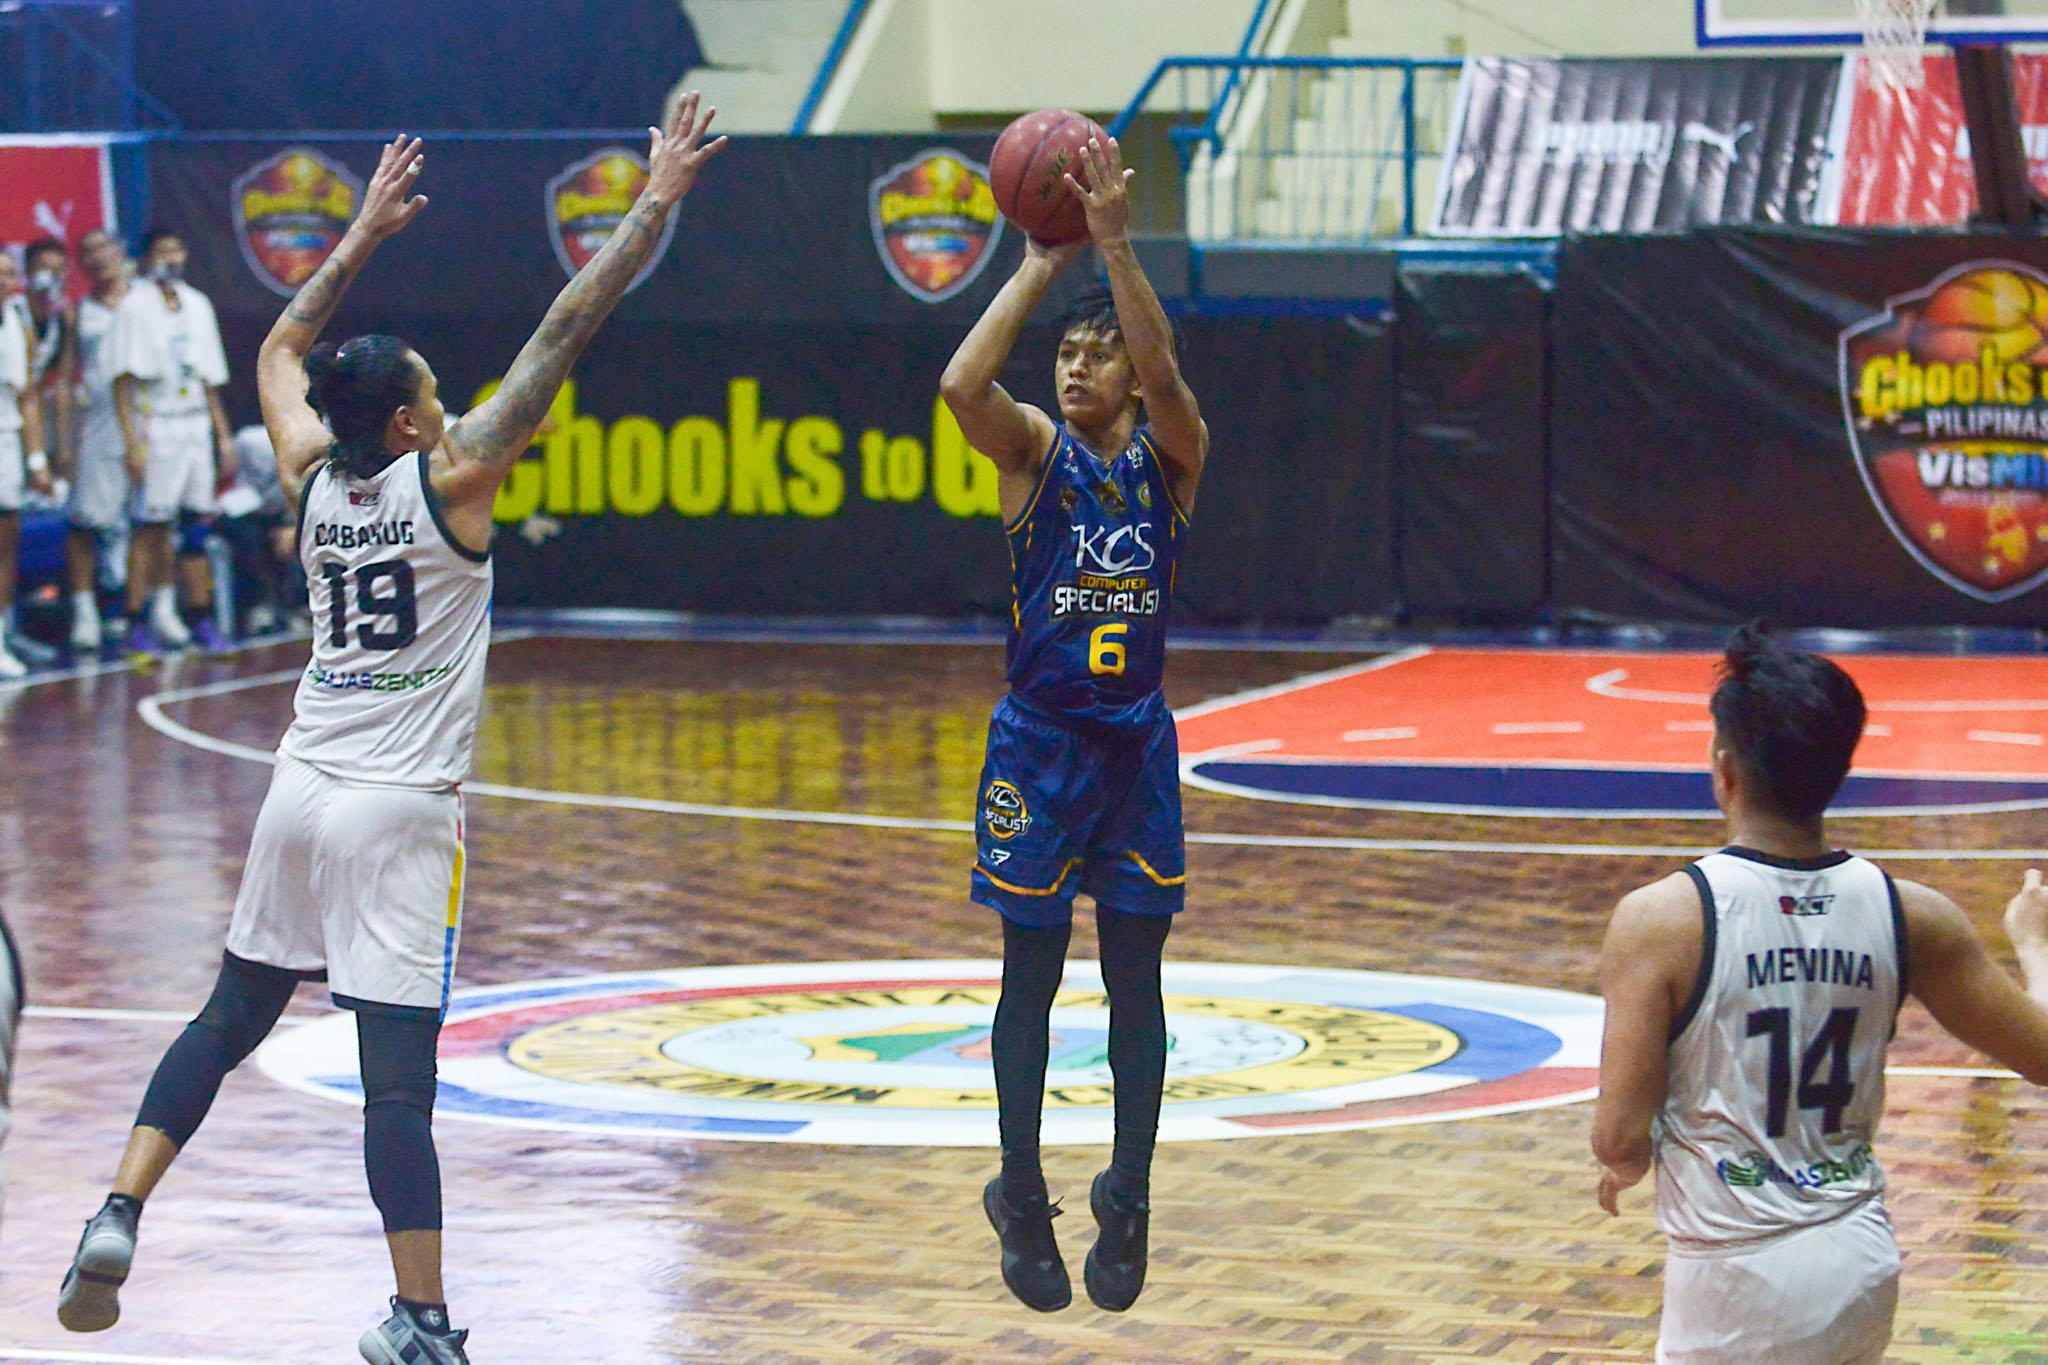 2021-Chooks-to-Go-VisMin-Cup-Visayas-Finals-Game-1-Talisay-vs-Mandaue-Shaq-Imperial-2 Young Shaq Imperial unfazed by VisMin Finals' bright lights Basketball News VisMin Super Cup  - philippine sports news